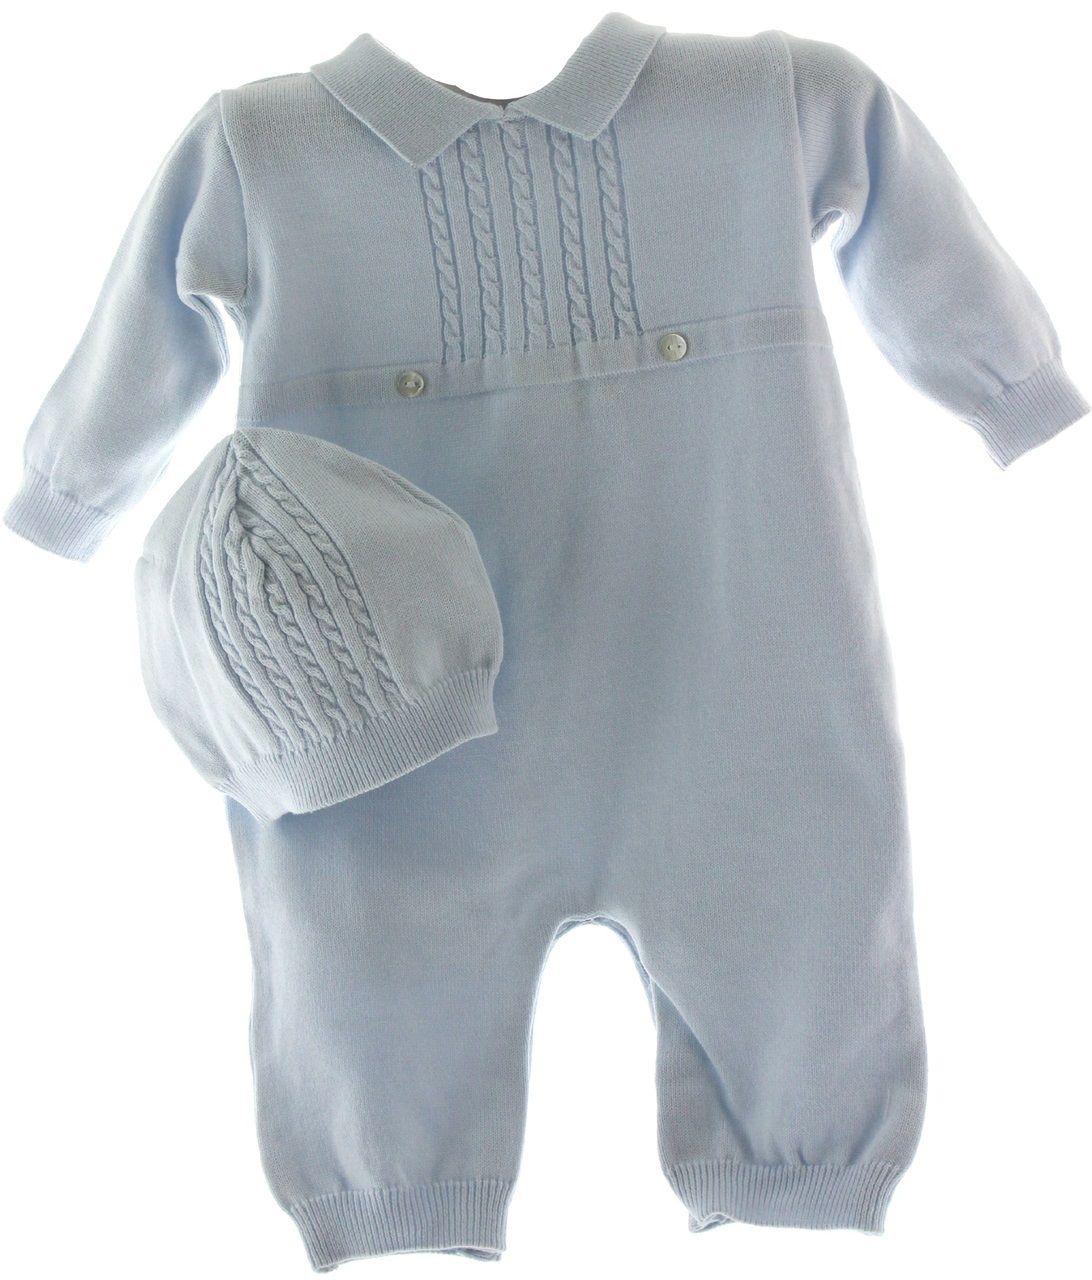 Baby Boys Blue Knit Long Sleeve Romper Amp Hat Set Knit